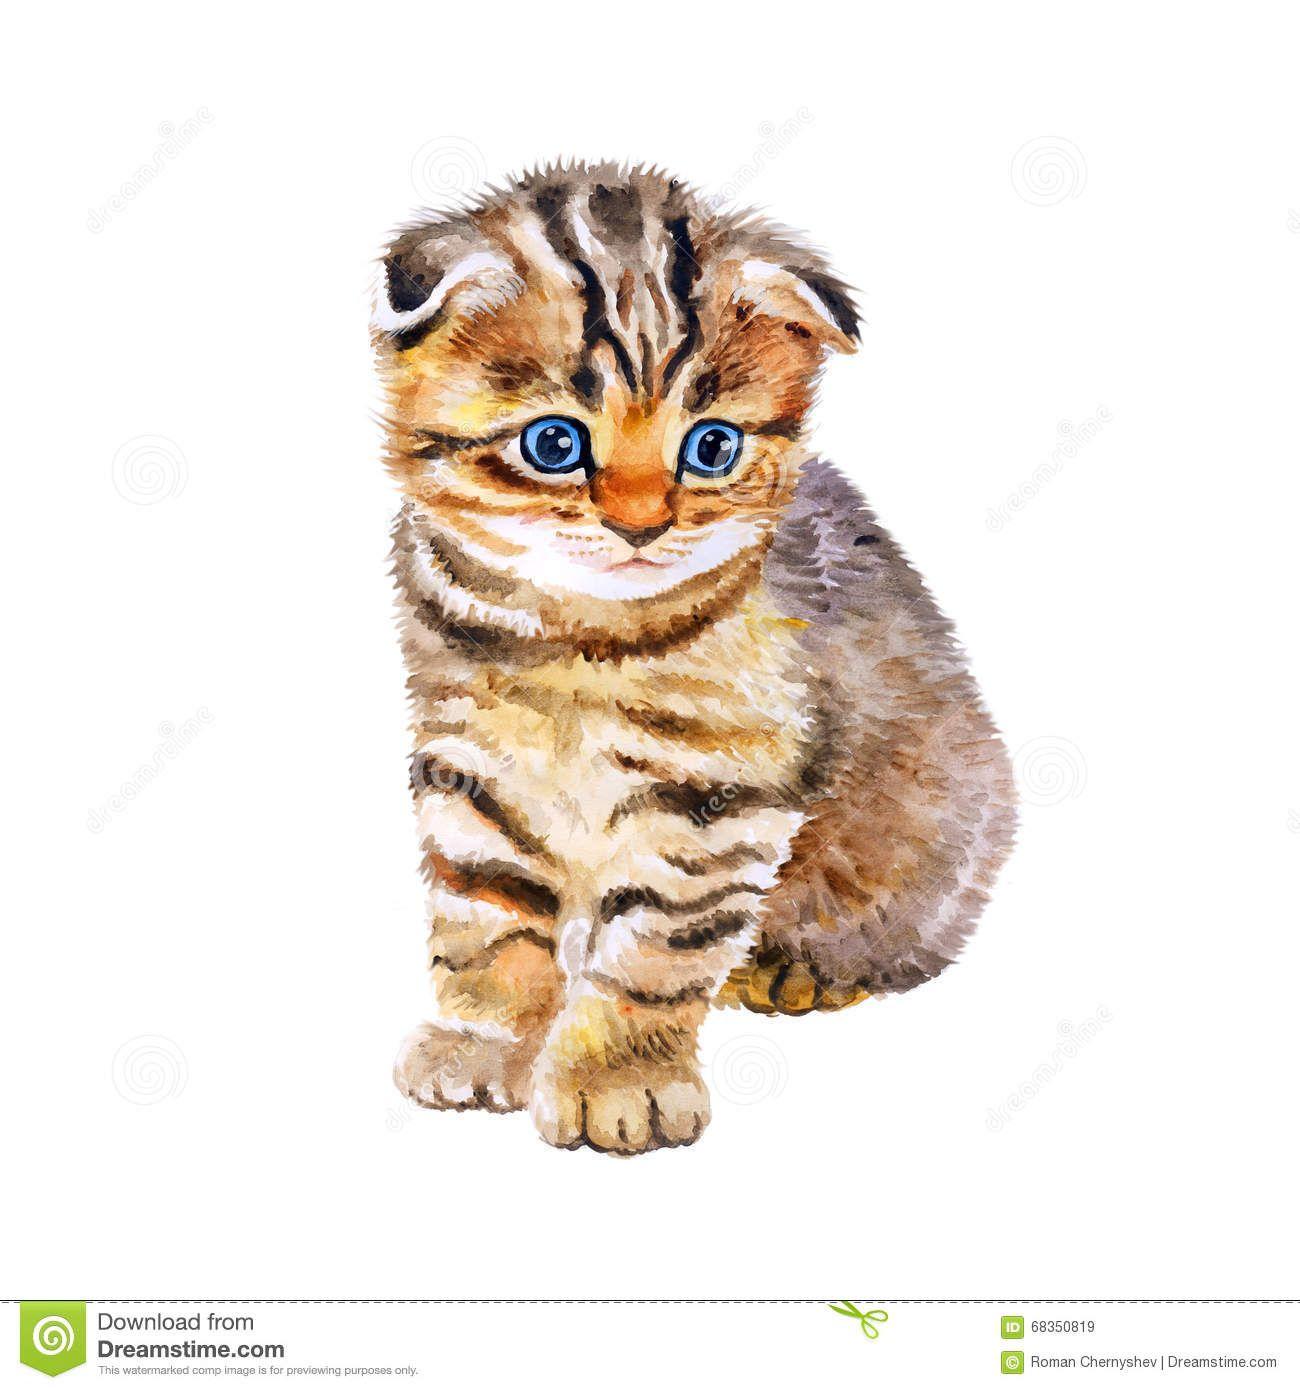 Watercolor Portrait Of British Scottish Fold Kitten With Odd Eyes On White Background Hand Drawn Sweet Home Pet Cat Scottish Fold Cat Posters Scottish Fold